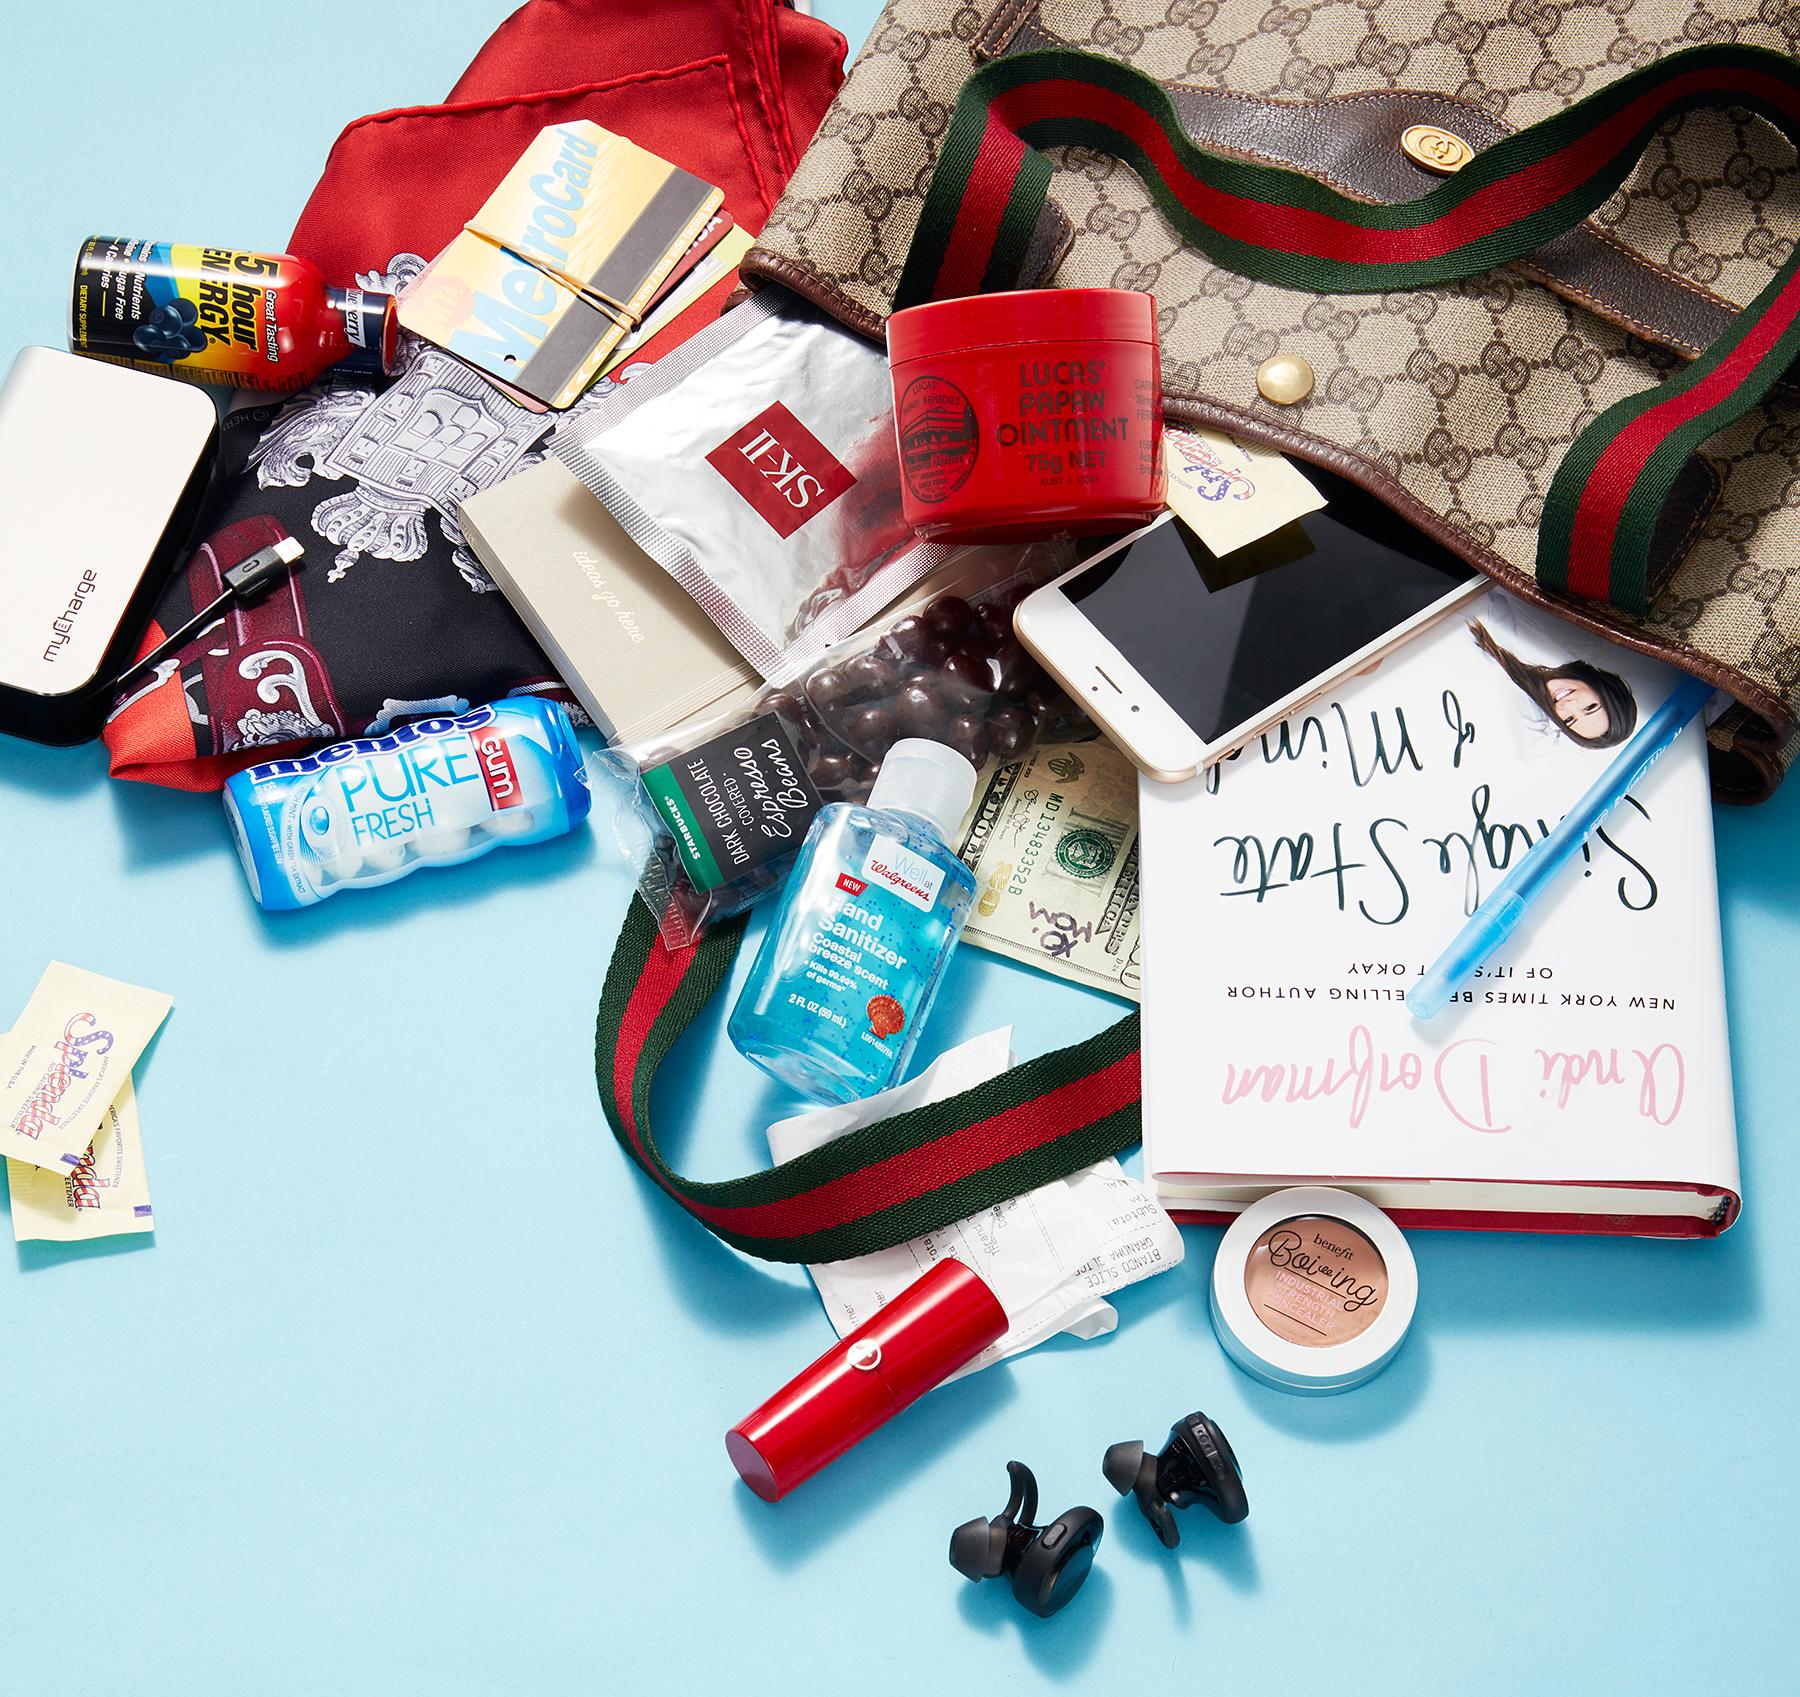 Andi Dorfman's bag